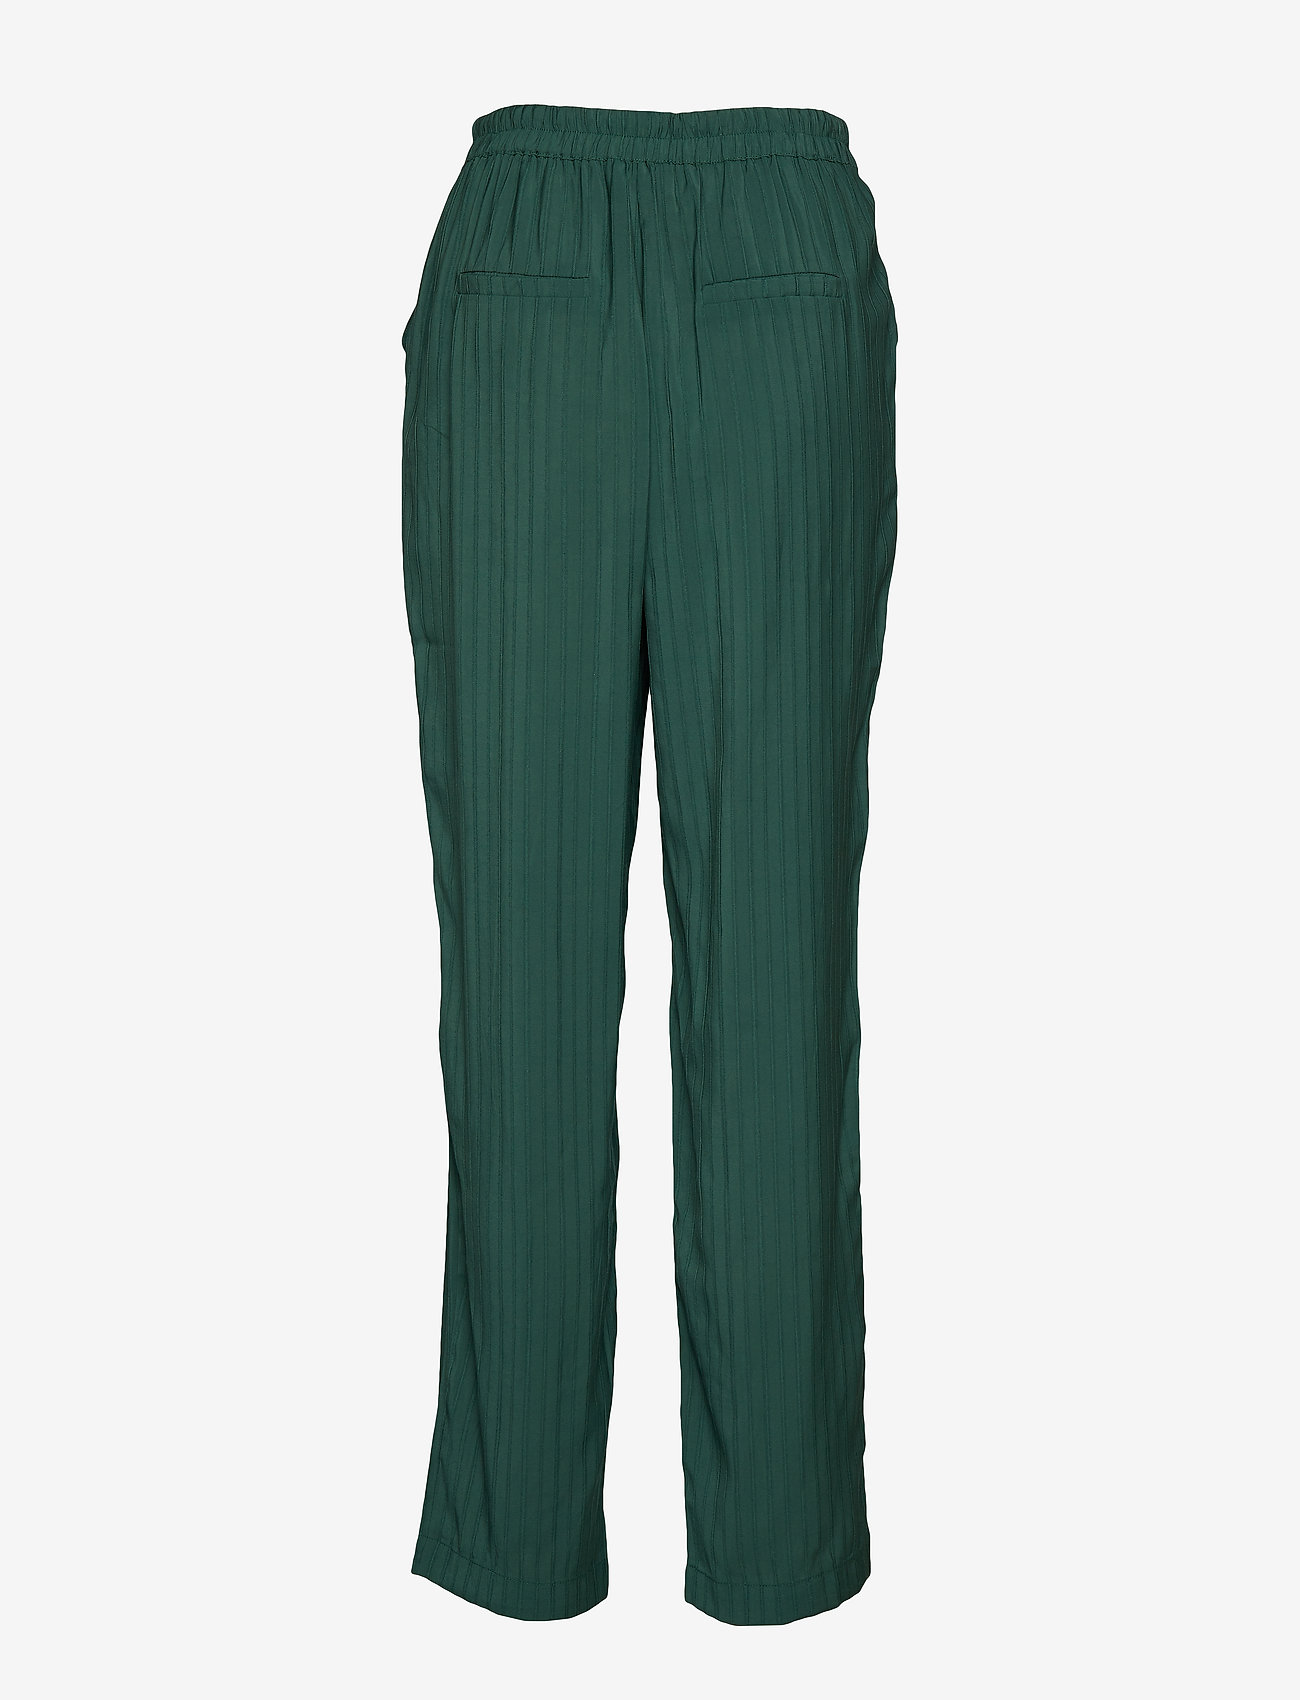 Minus - Summer pants - hunter green - 1